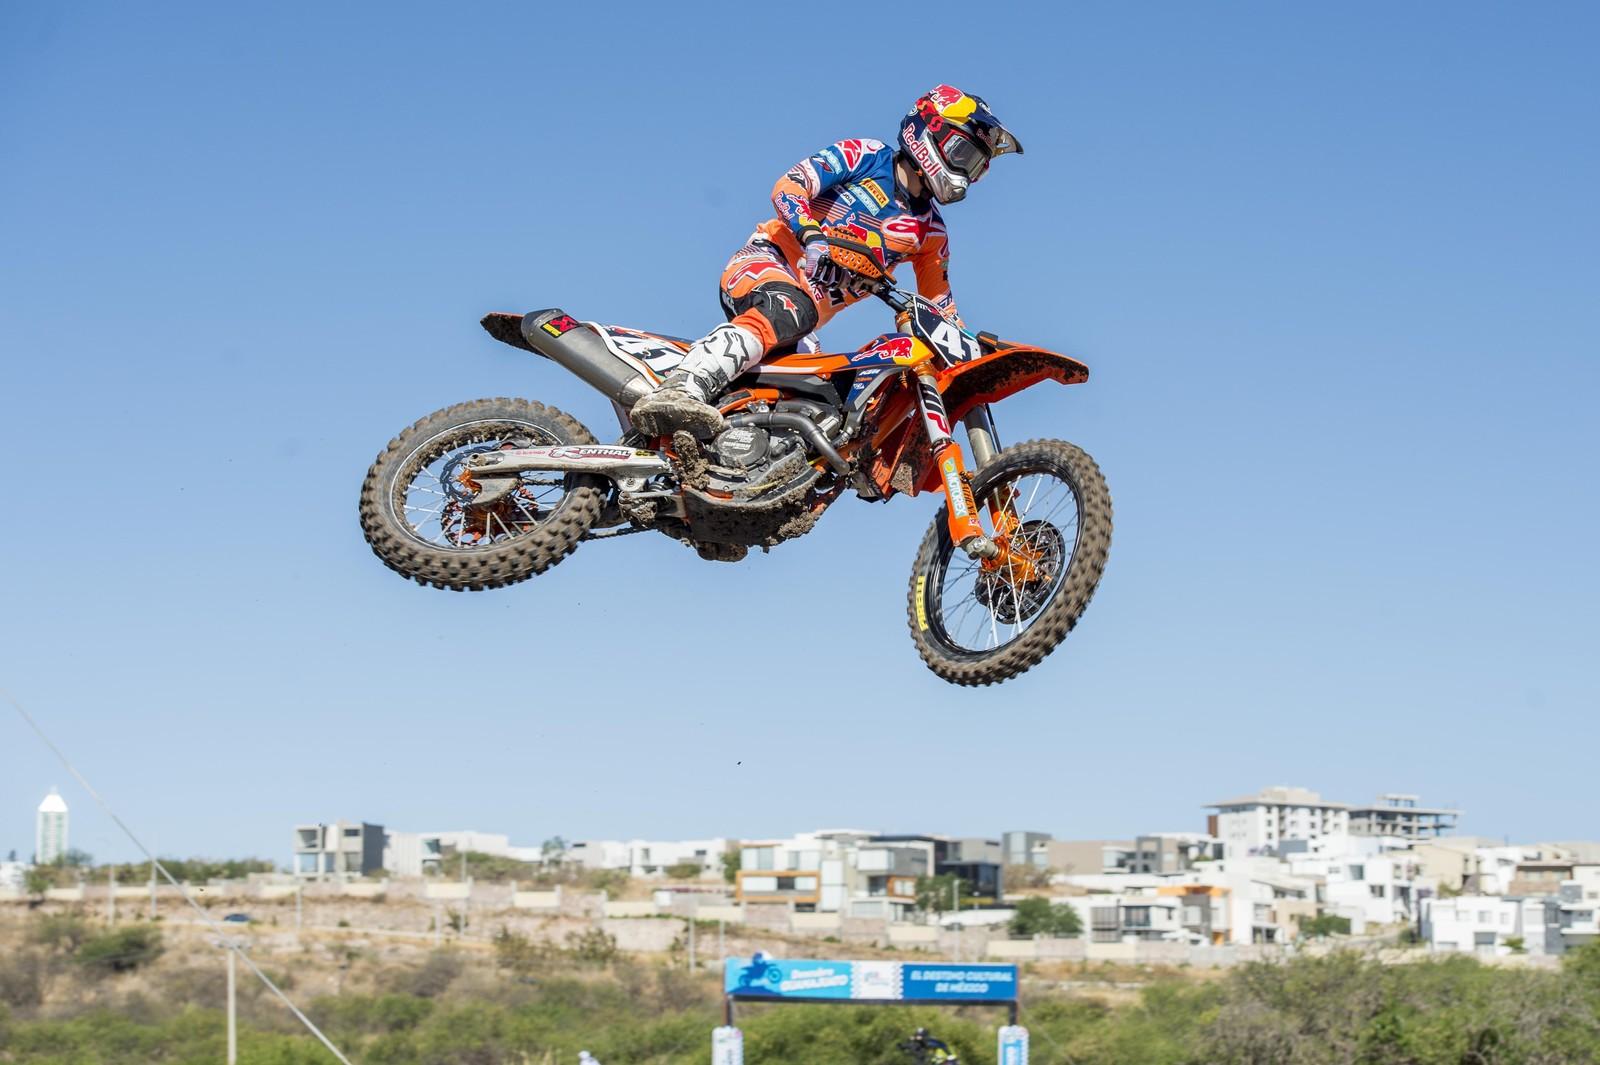 Pauls Jonass - Photo Blast: 2017 MXGP of Mexico - Motocross Pictures - Vital MX